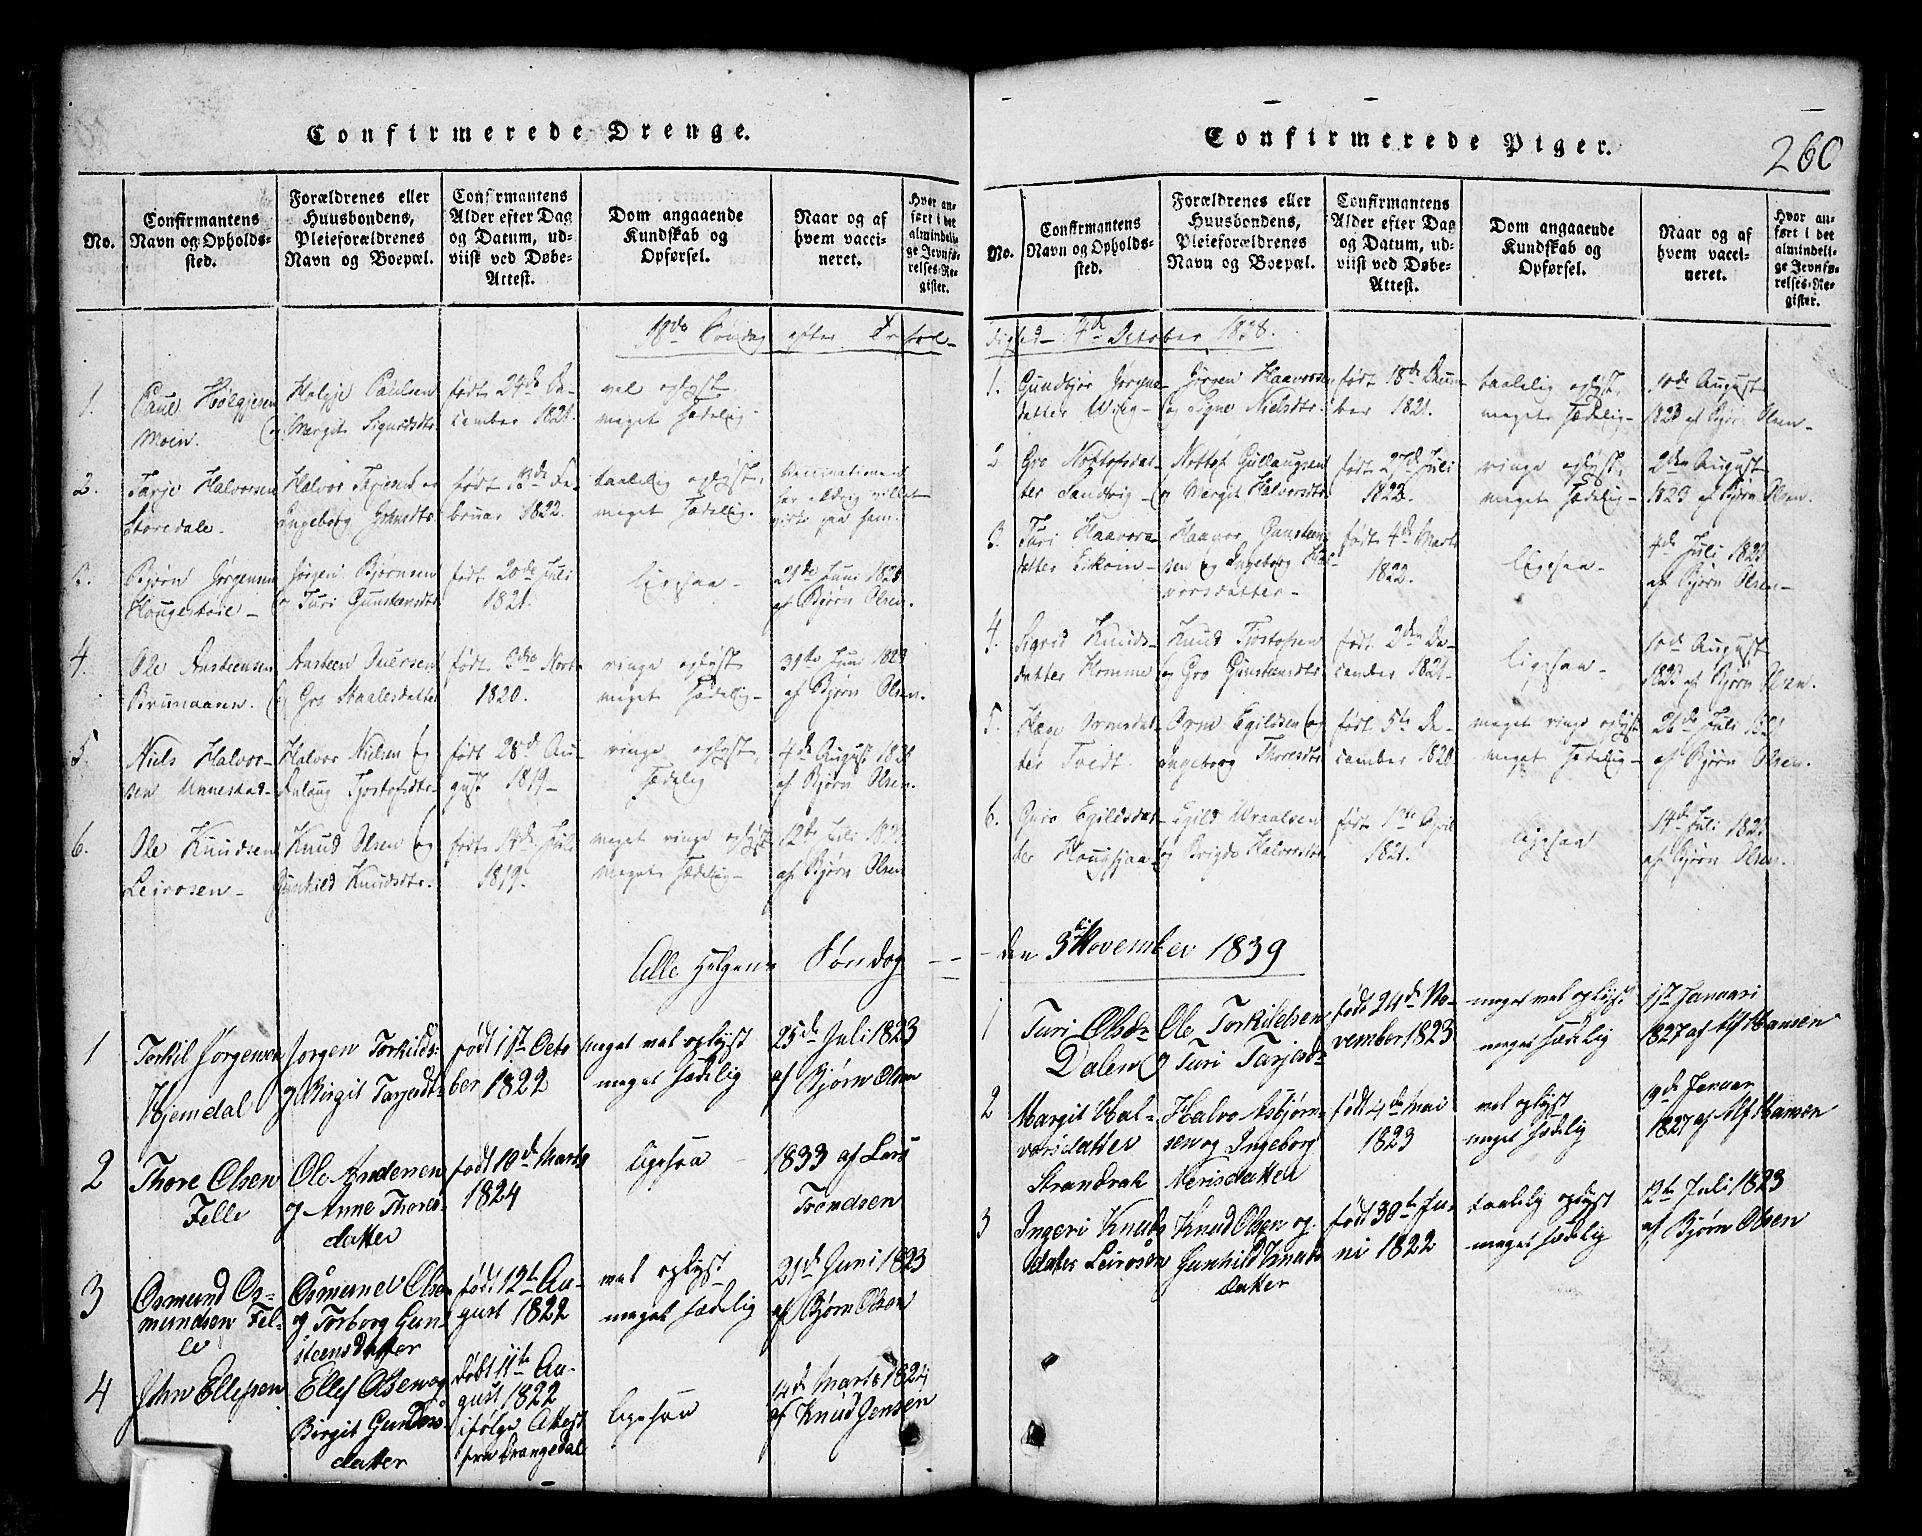 SAKO, Nissedal kirkebøker, G/Gb/L0001: Klokkerbok nr. II 1, 1814-1862, s. 260